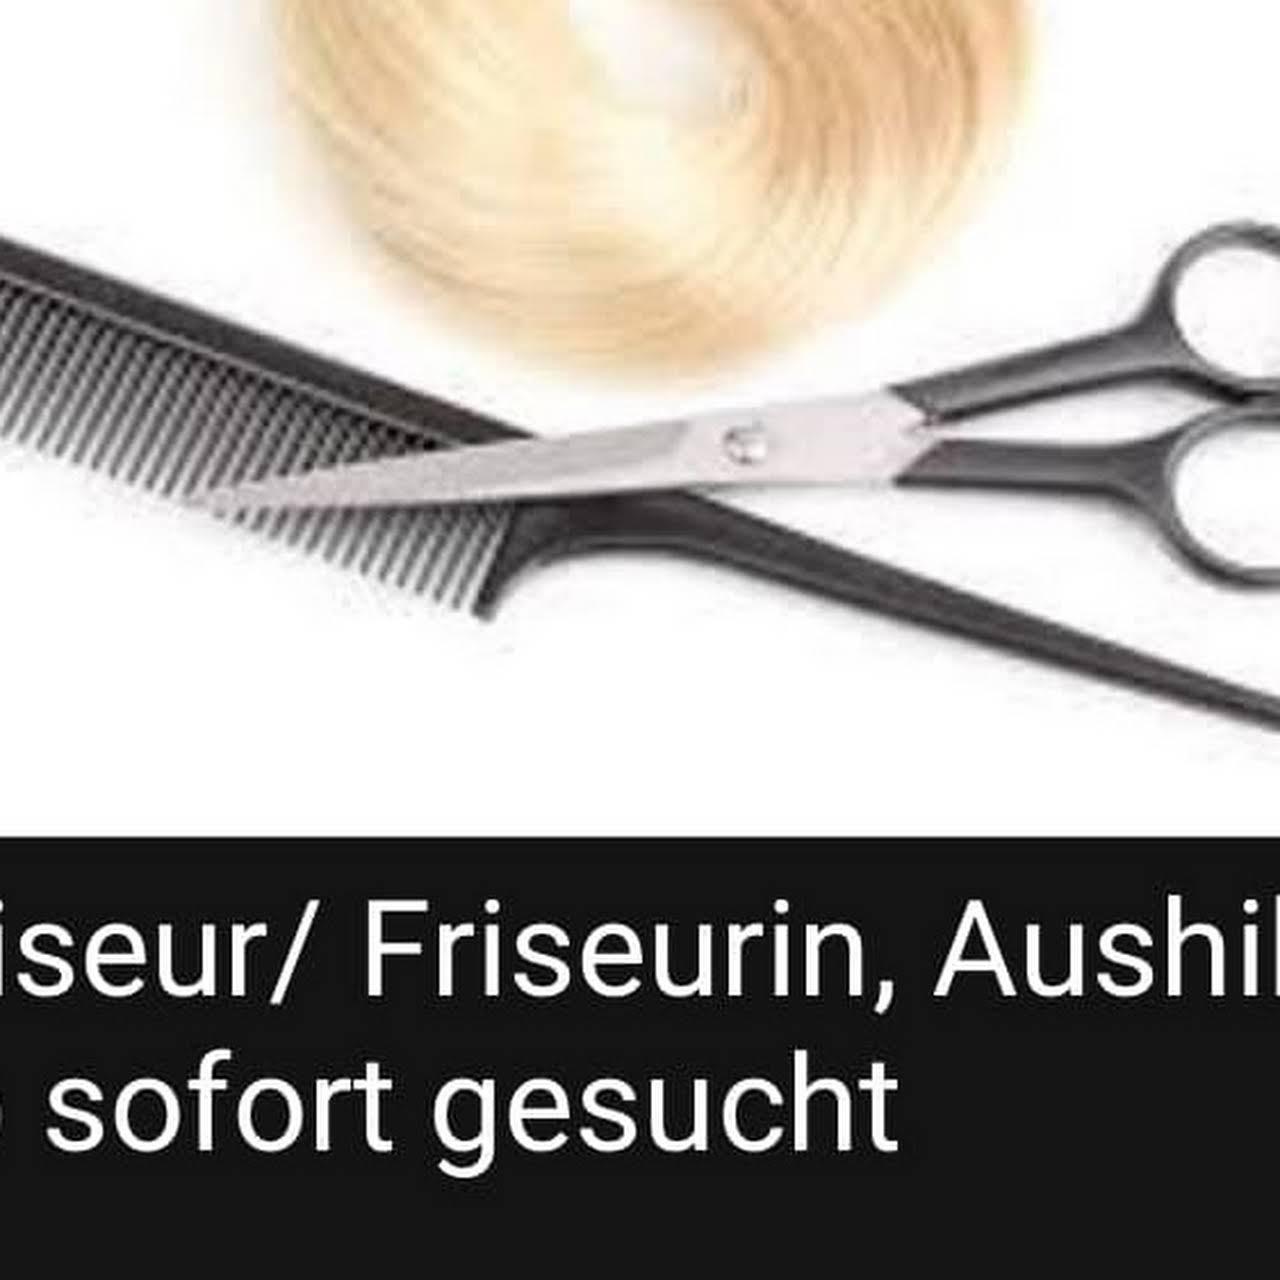 Friseur Salon Hila Im Kaufland Freising Friseursalon In Freising